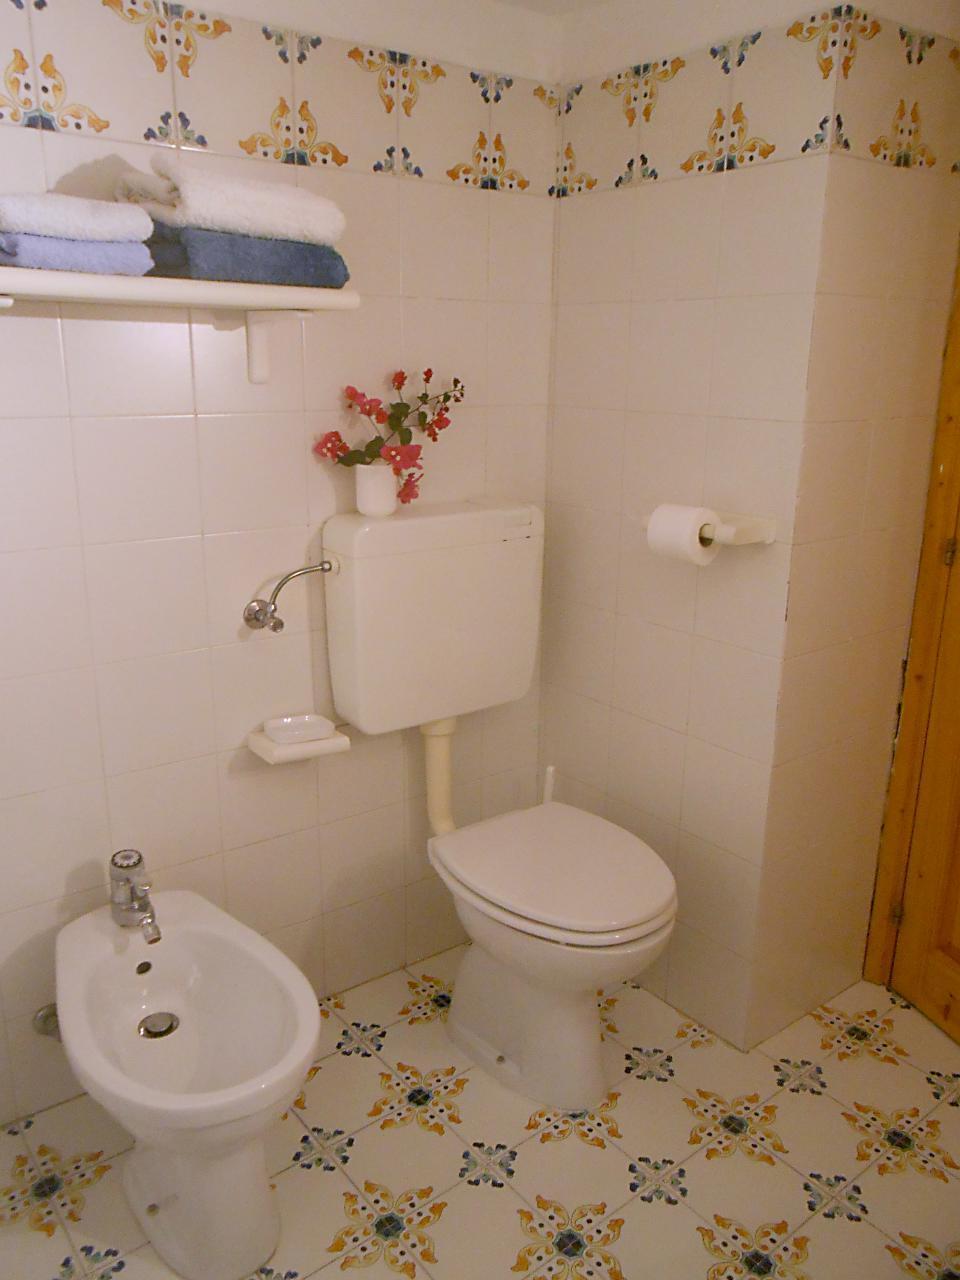 Maison de vacances Ferienhaushälfte Solandra auf sizilianischer Insel mit atemberaubenden Meeres-Rundblick (2038046), Lipari, Lipari, Sicile, Italie, image 28